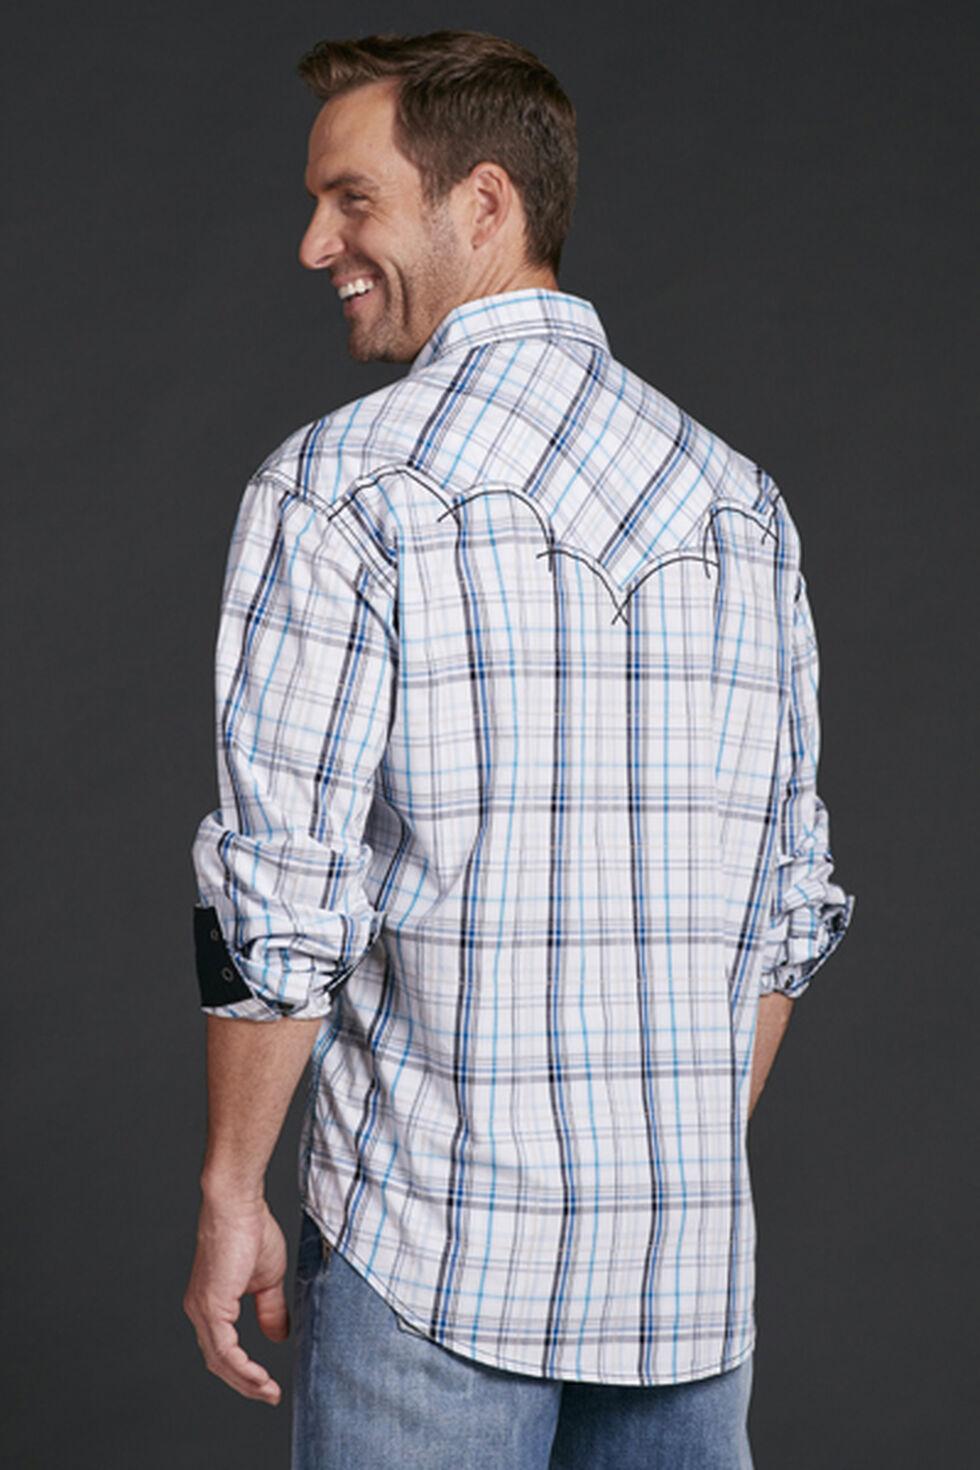 Cowboy Up Men's Blue Plaid Long Sleeve Shirt, Blue, hi-res